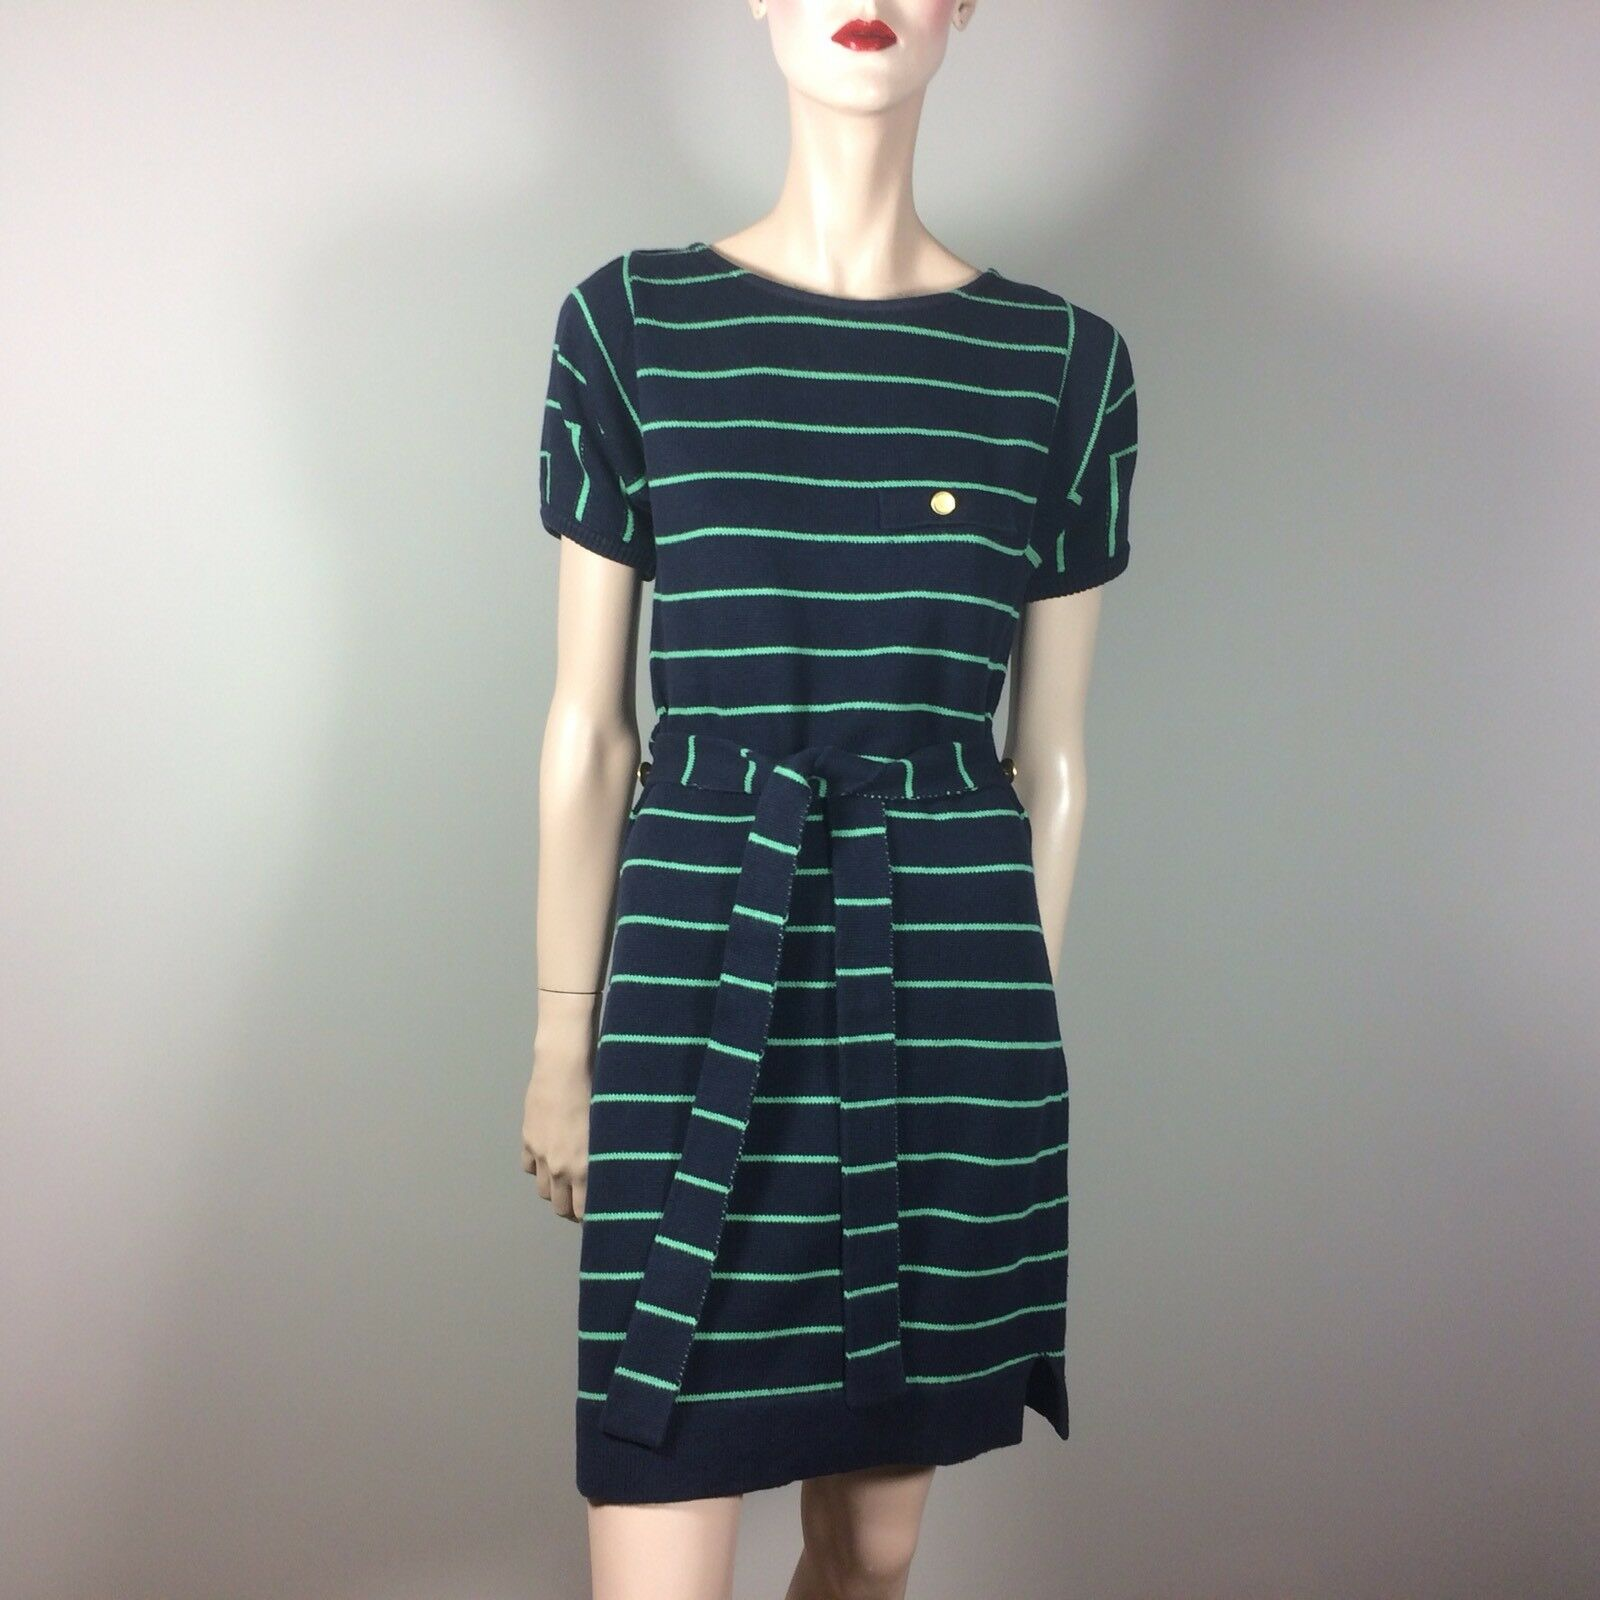 SEE BY CHLOÈ Damen Strick Kleid M 38 Blau Grün Gestreift Casual Chic Boho Style